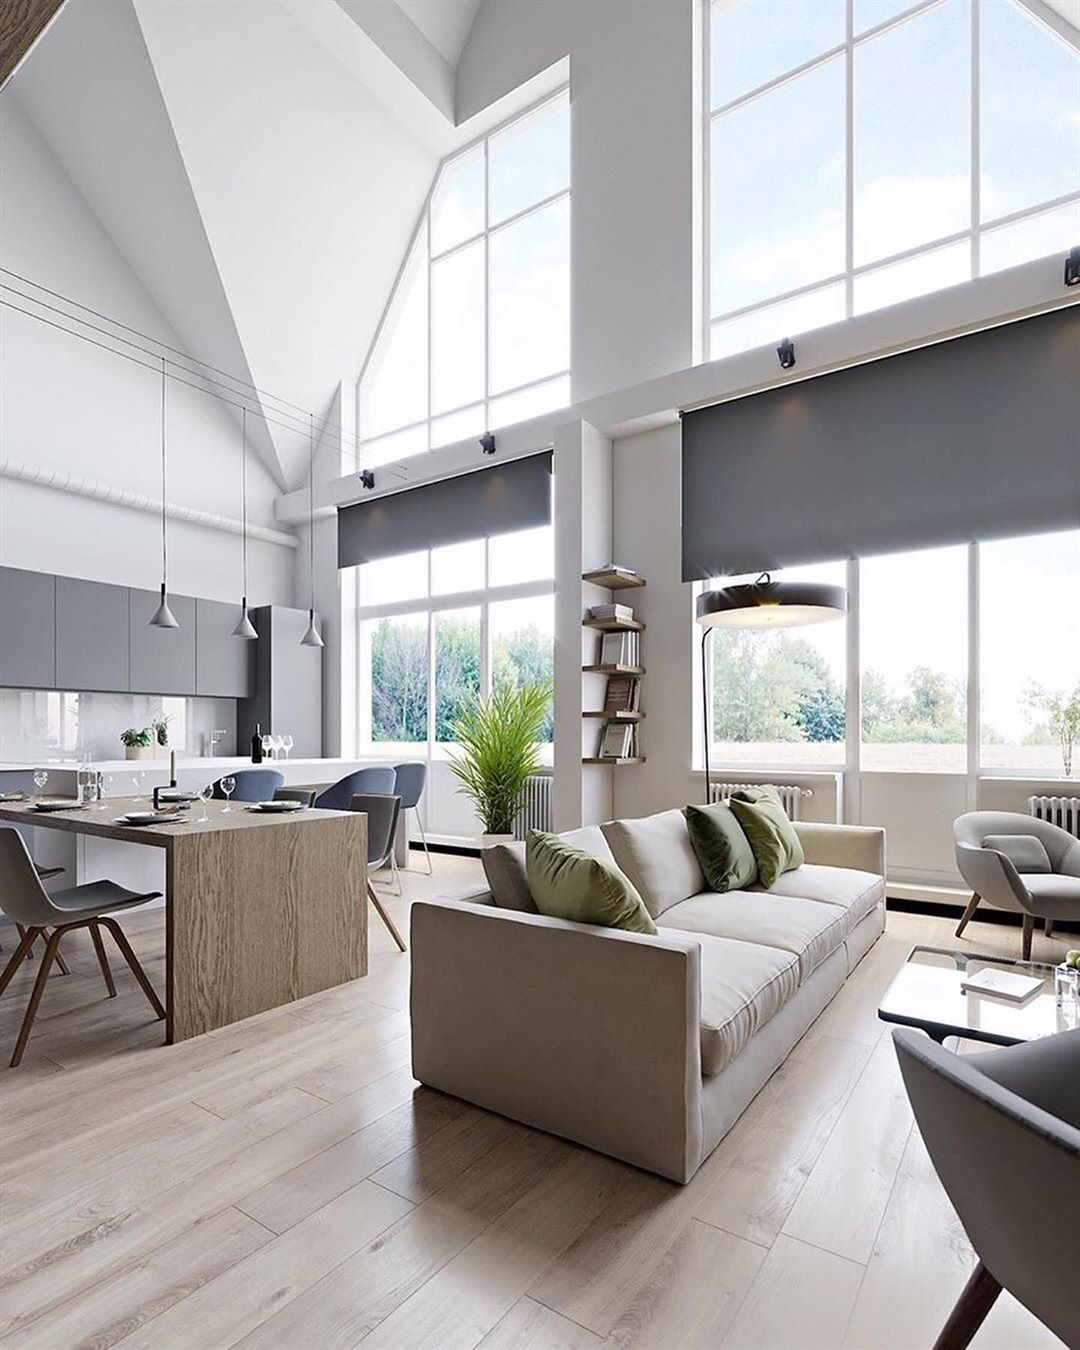 Best 26 Beegcom Traditional Home Decor Pinterest Home Decor Trending Decor Home Decor Trends